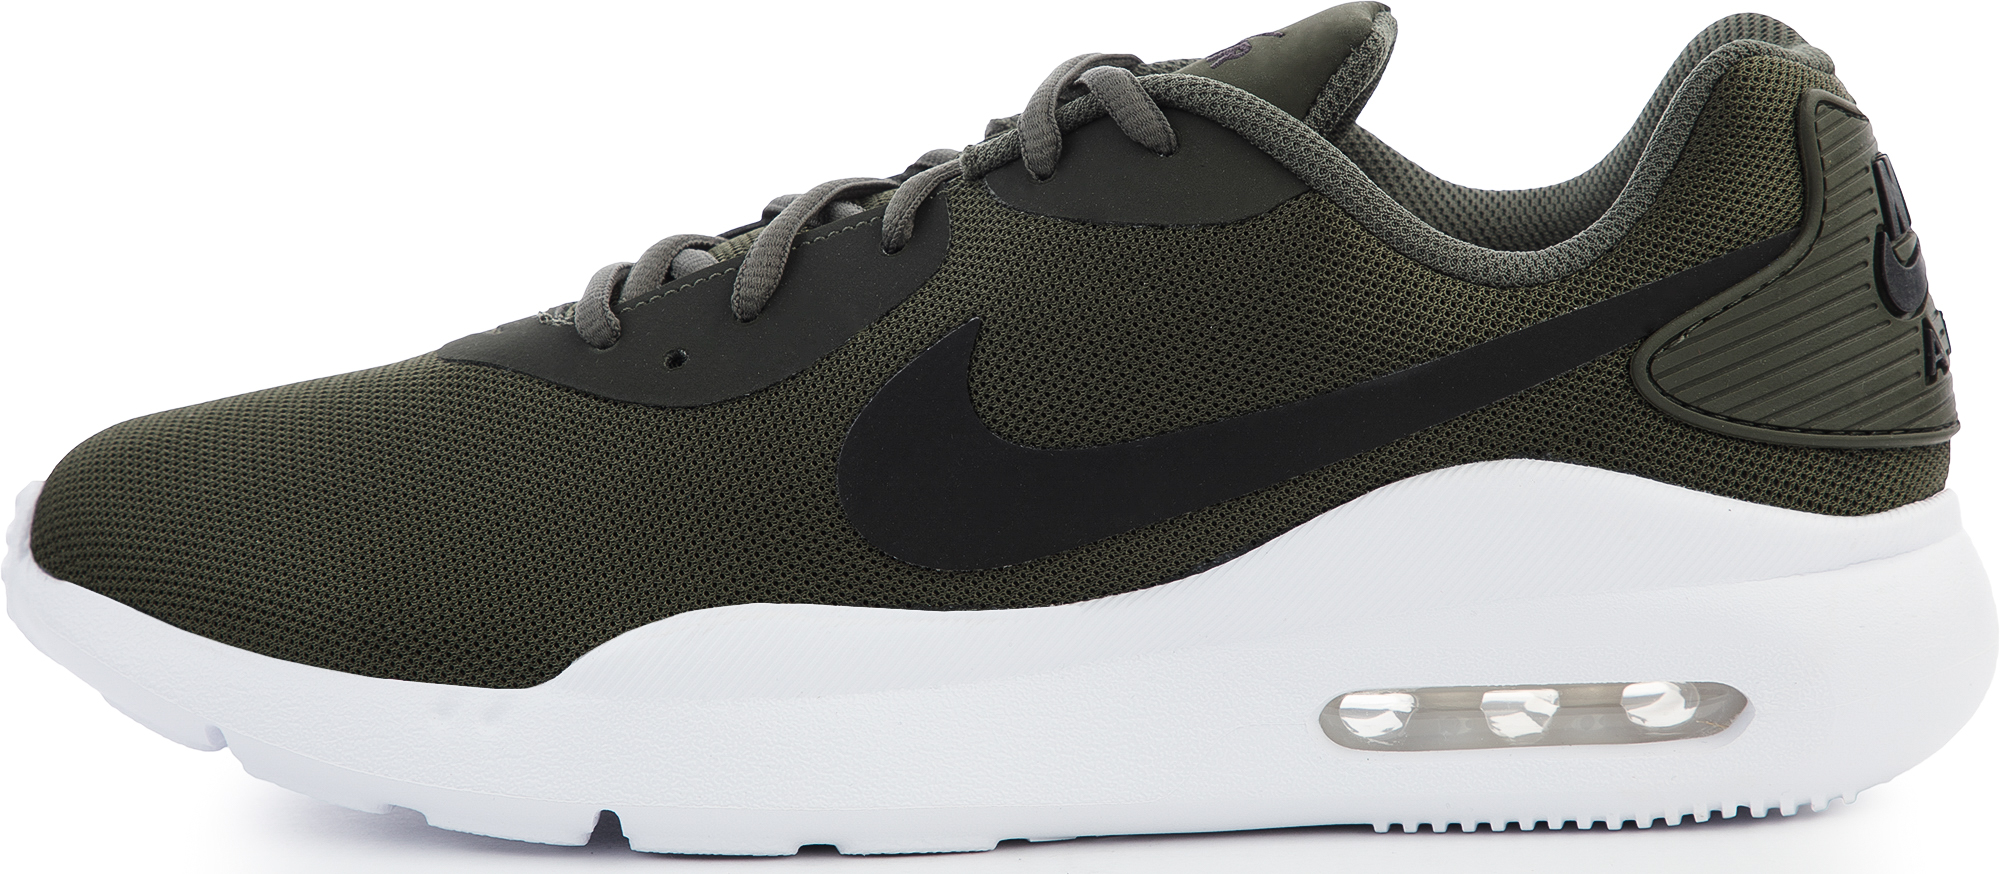 Nike Кроссовки мужские Nike Air Max Oketo, размер 45 цена 2017